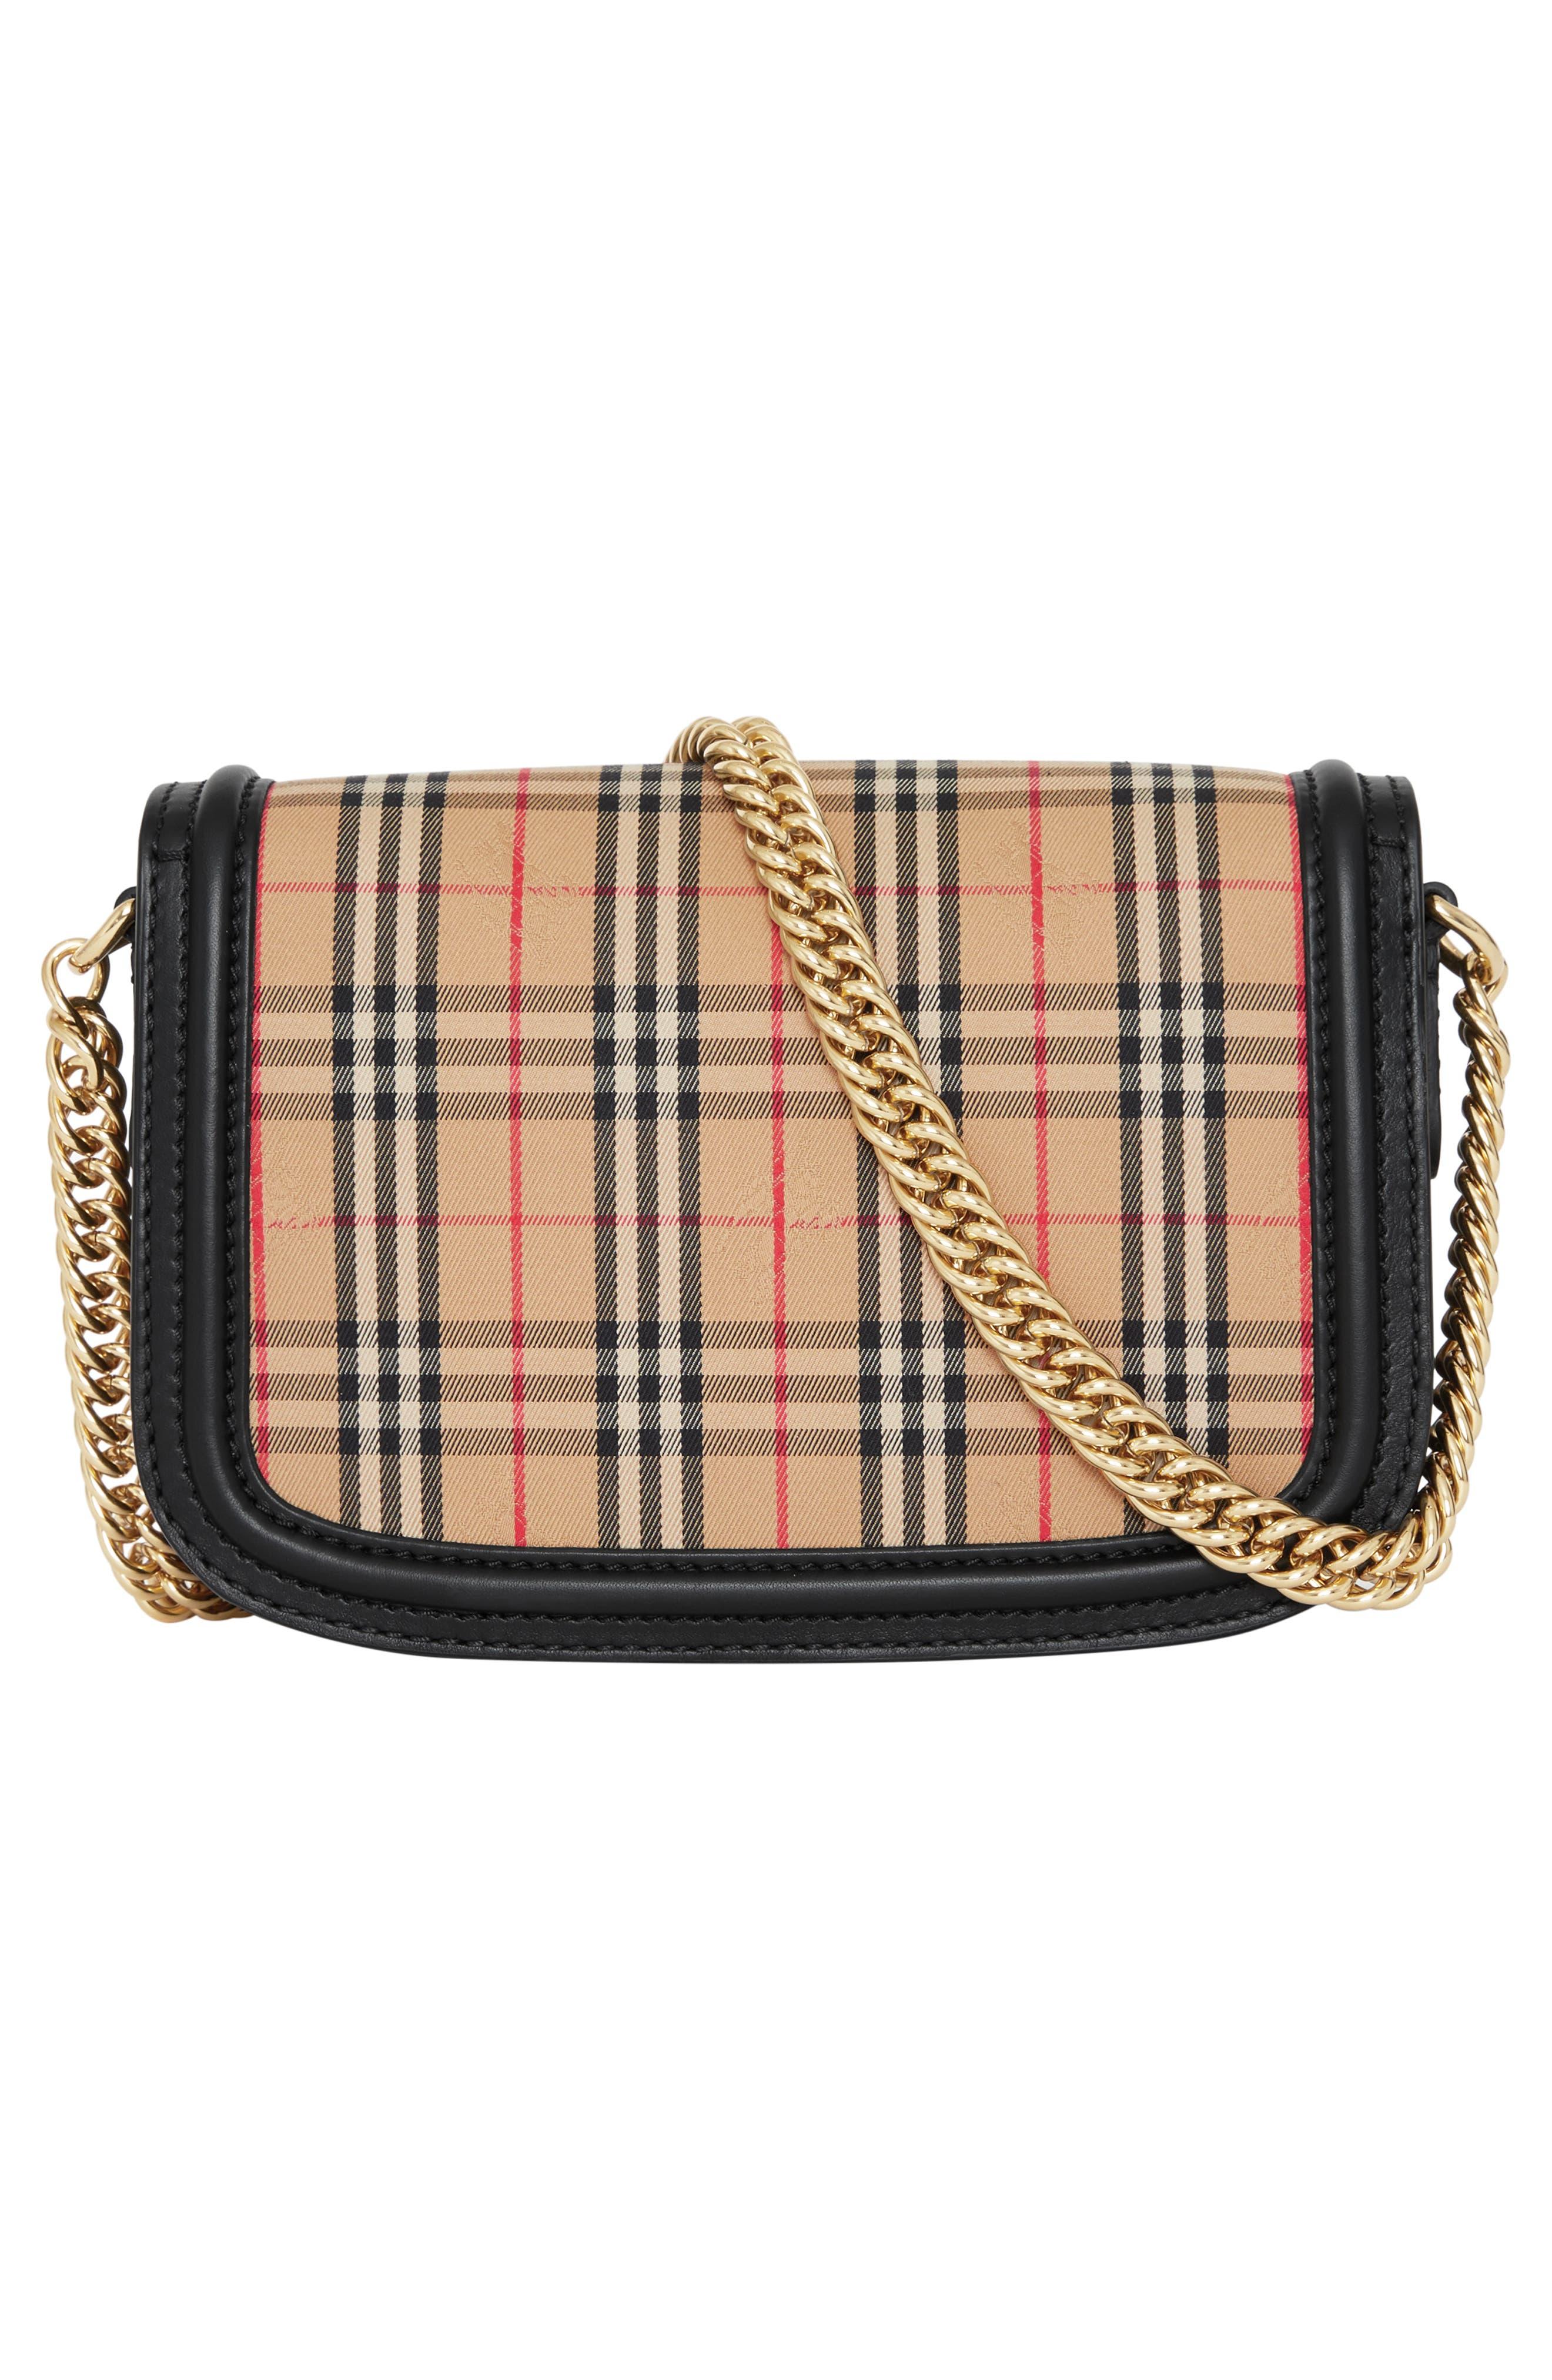 Vintage Check Link Flap Crossbody Bag,                             Alternate thumbnail 3, color,                             BLACK